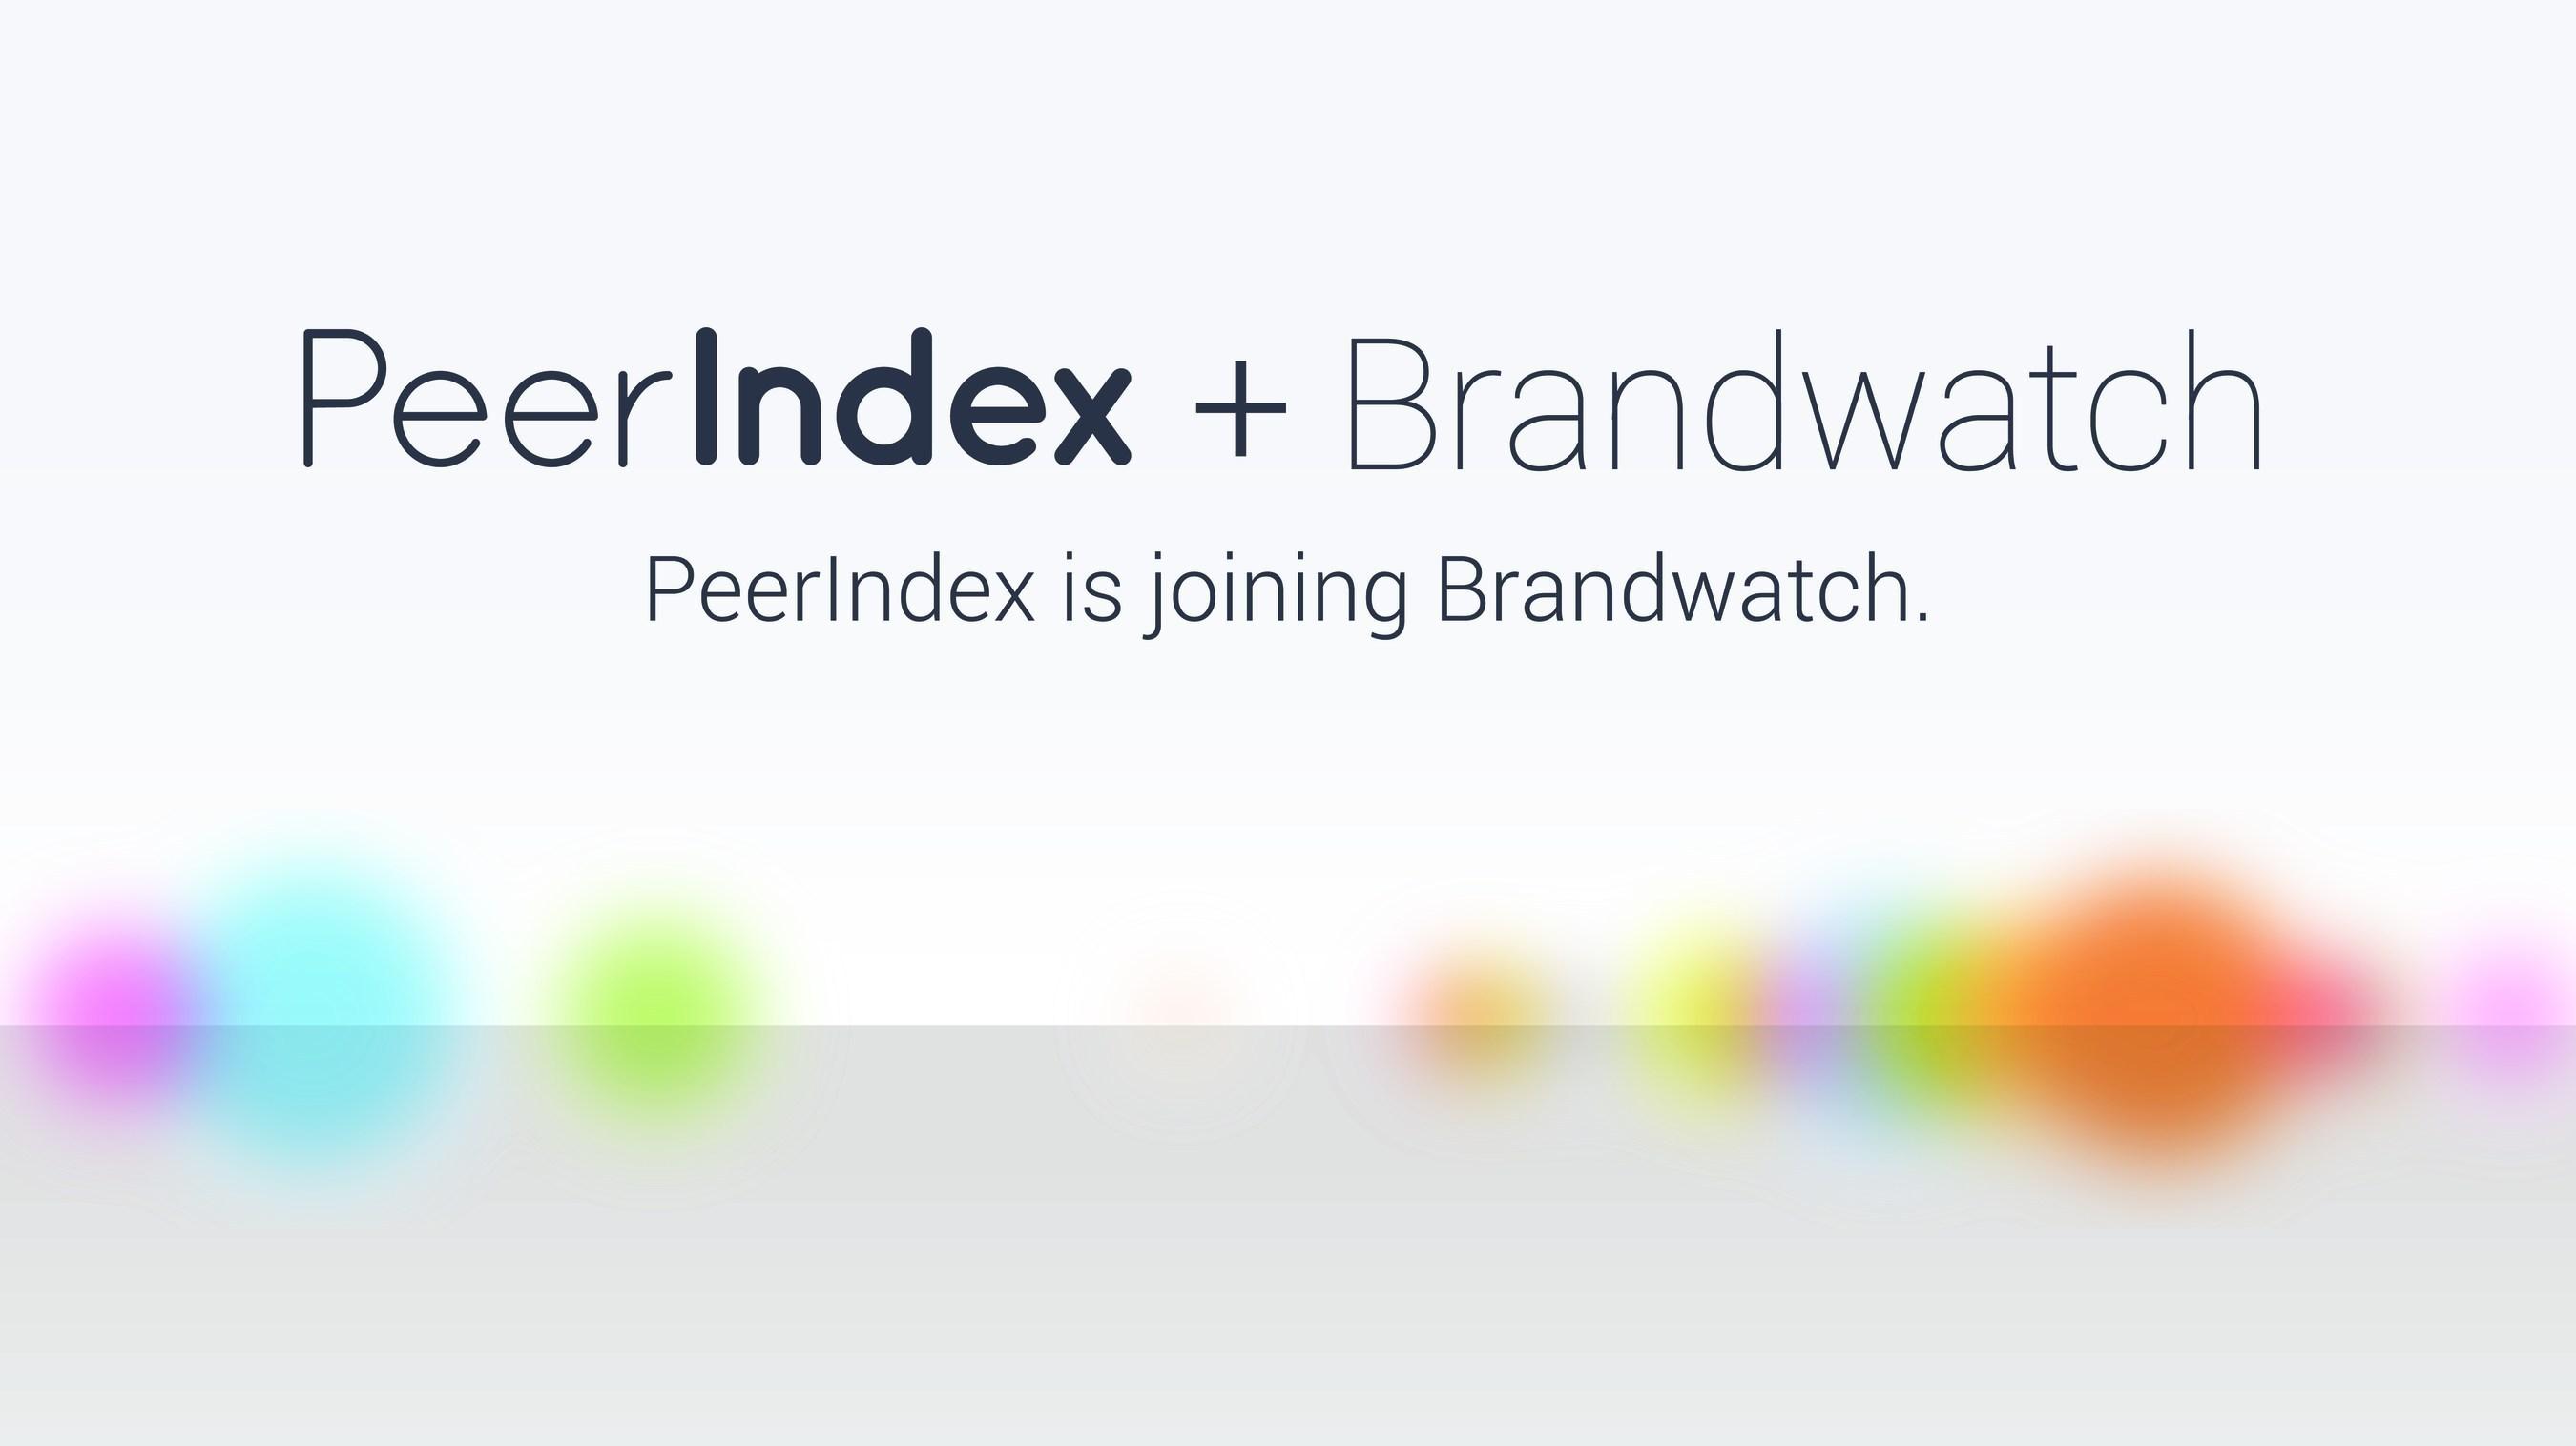 Brandwatch announces acquisition of PeerIndex